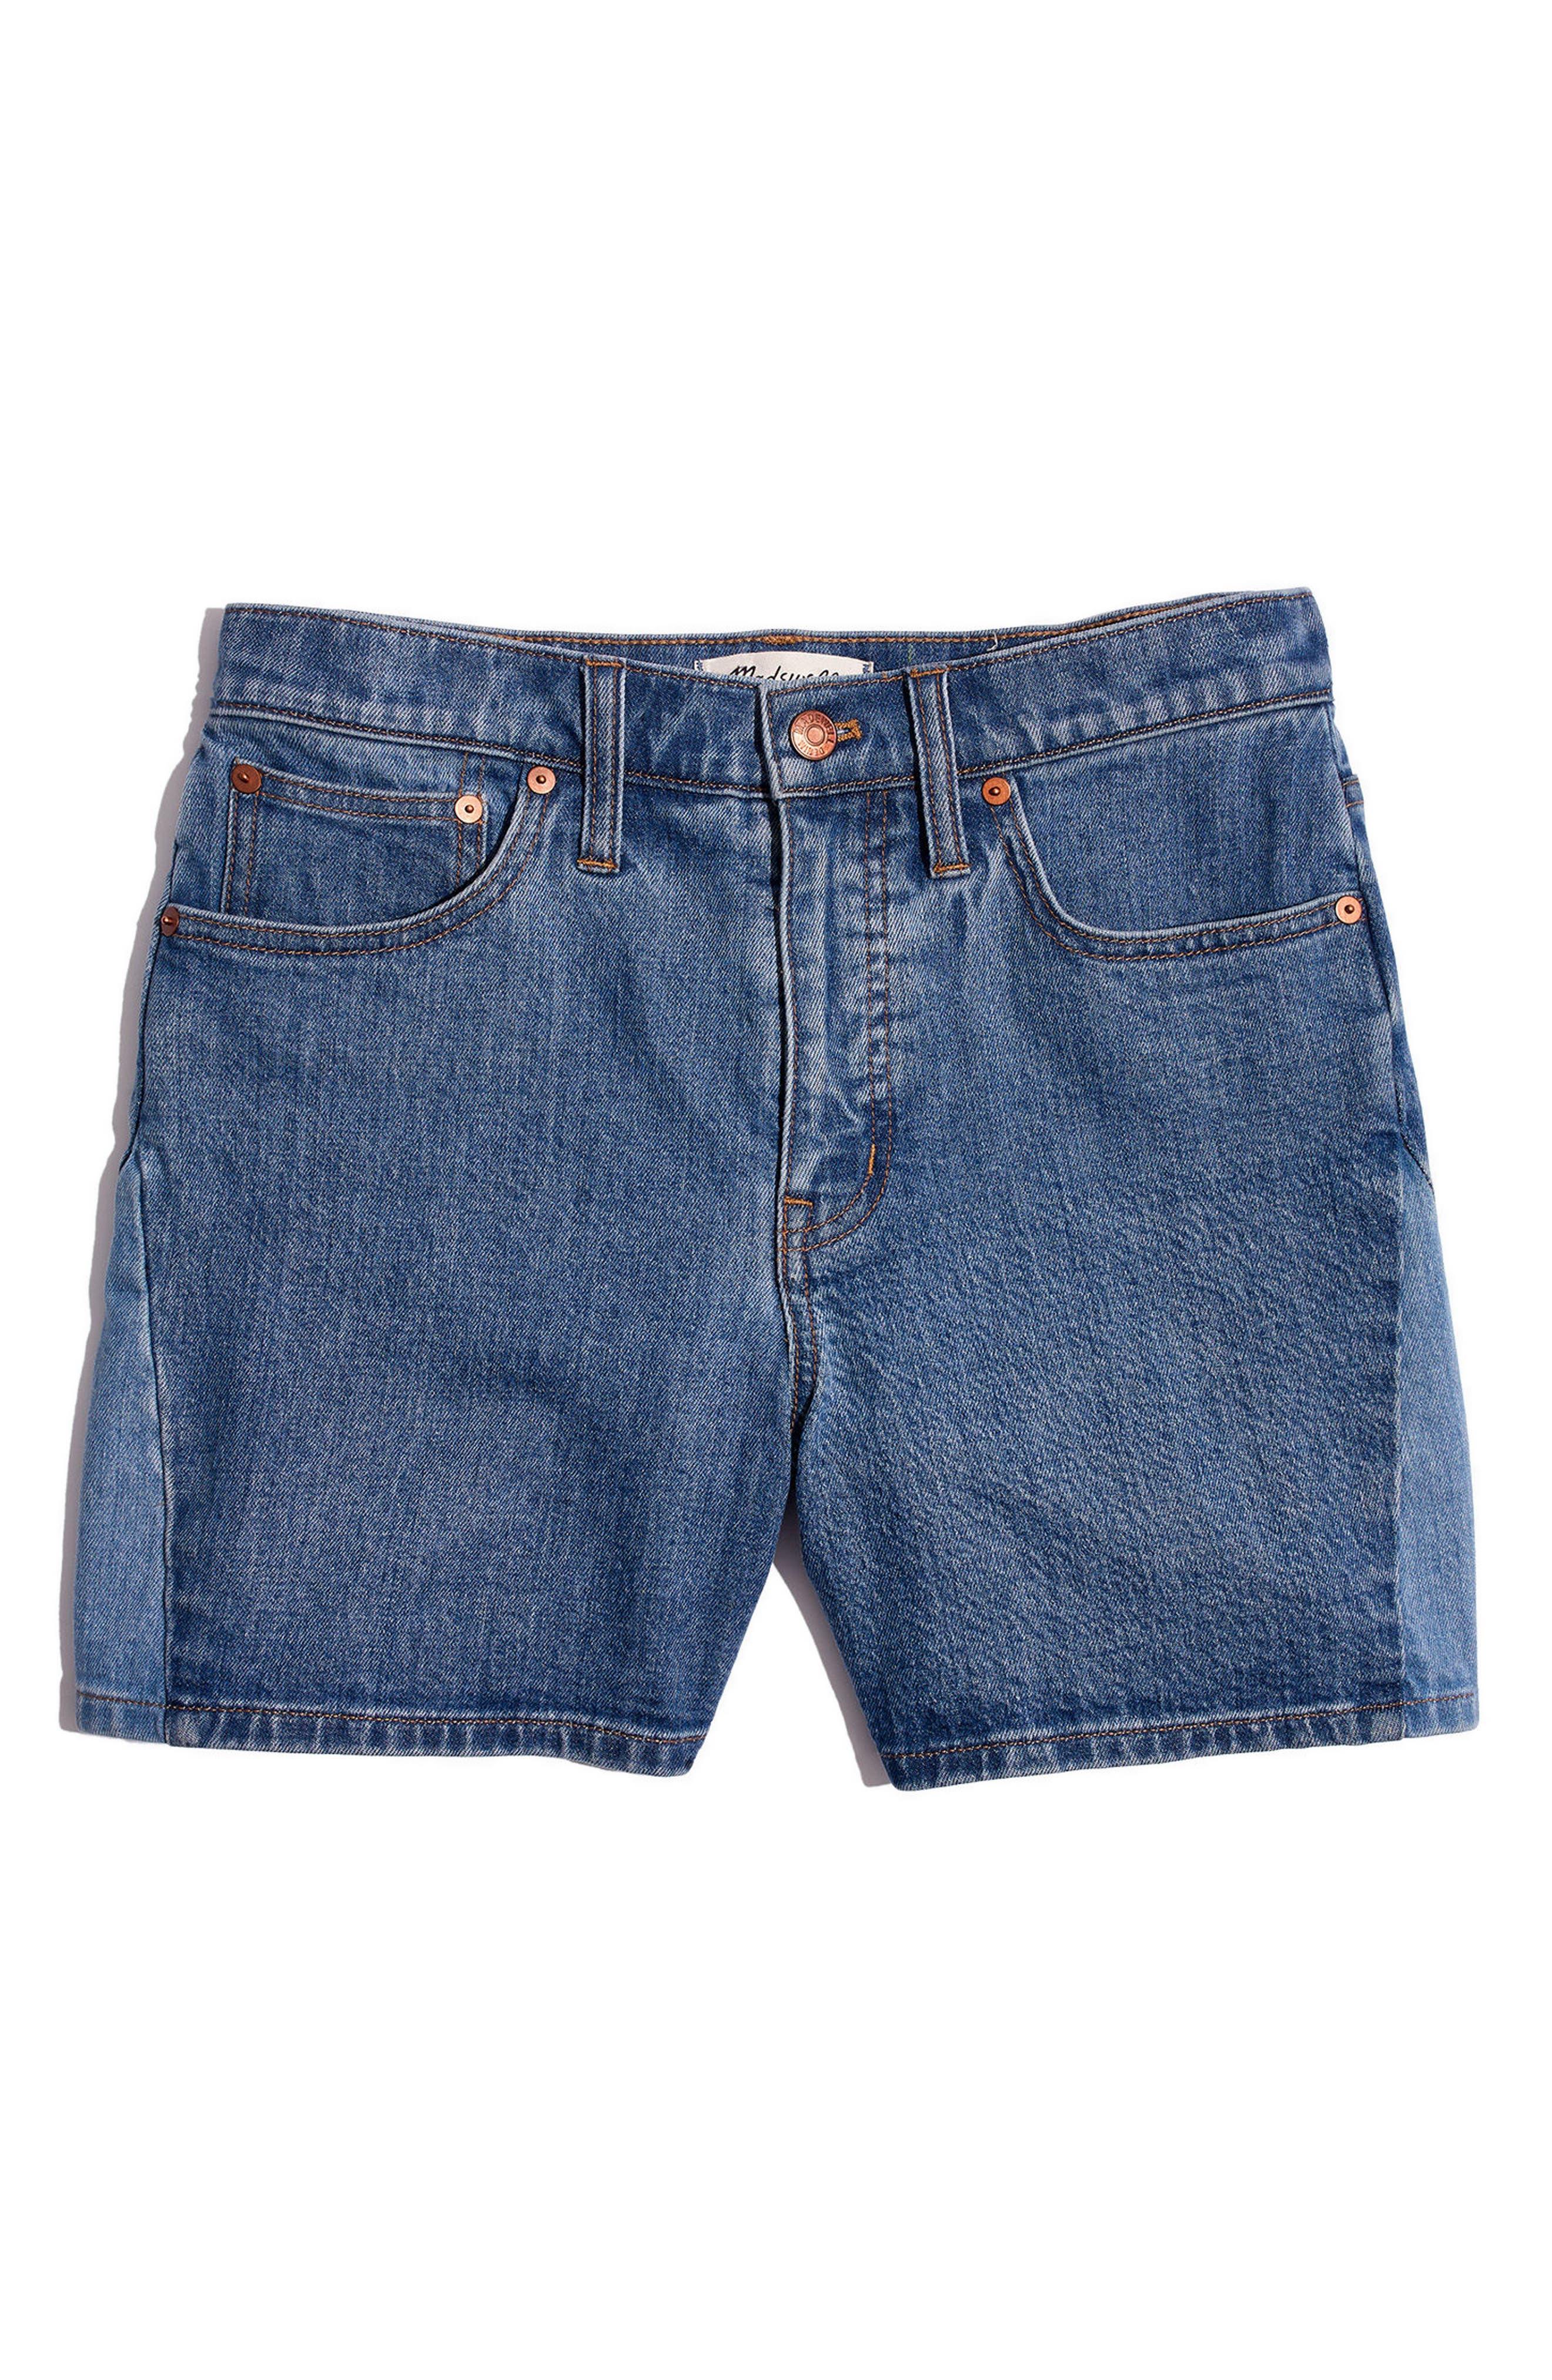 High Waist Pieced Denim Shorts,                             Alternate thumbnail 4, color,                             Wylie